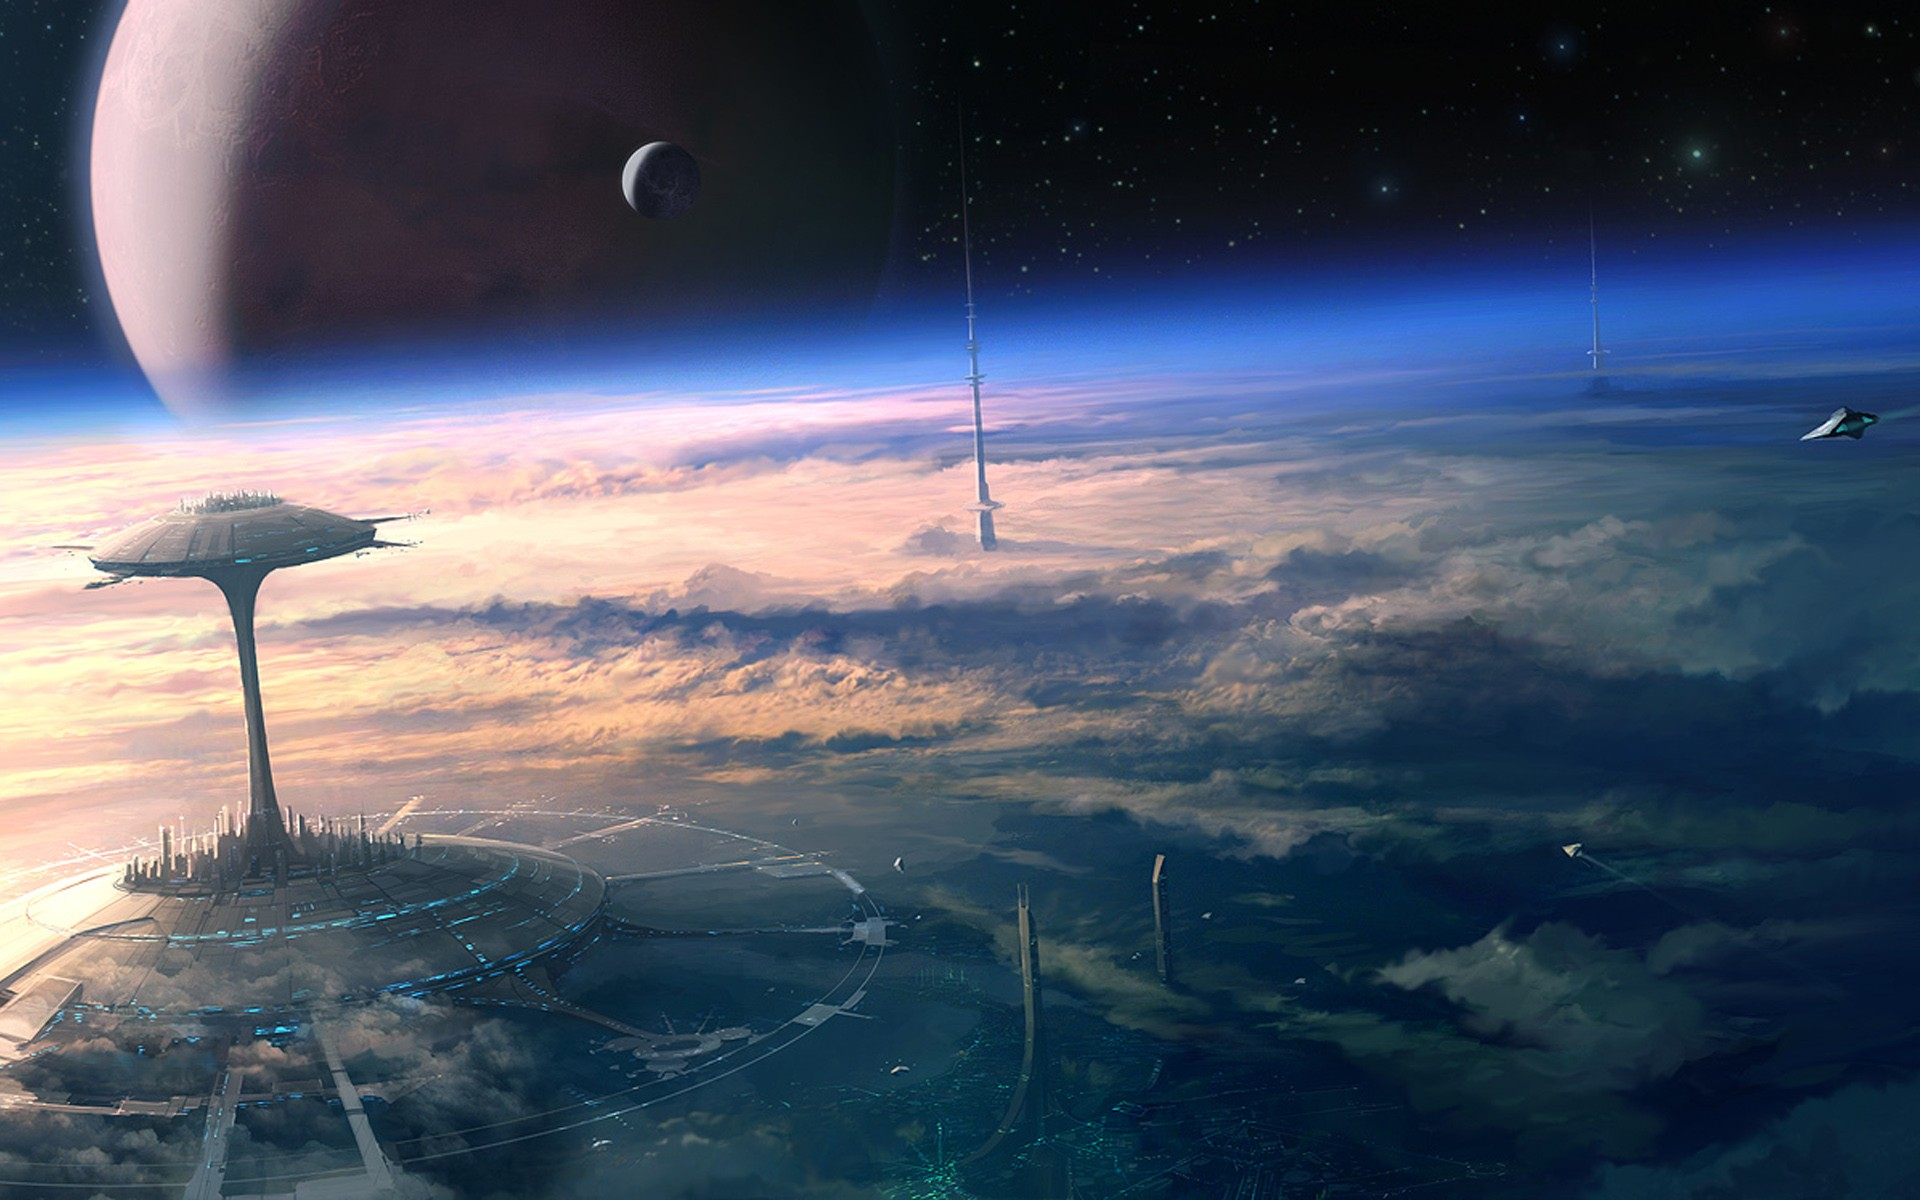 General 1920x1200 digital art space science fiction futuristic planet atmosphere space art